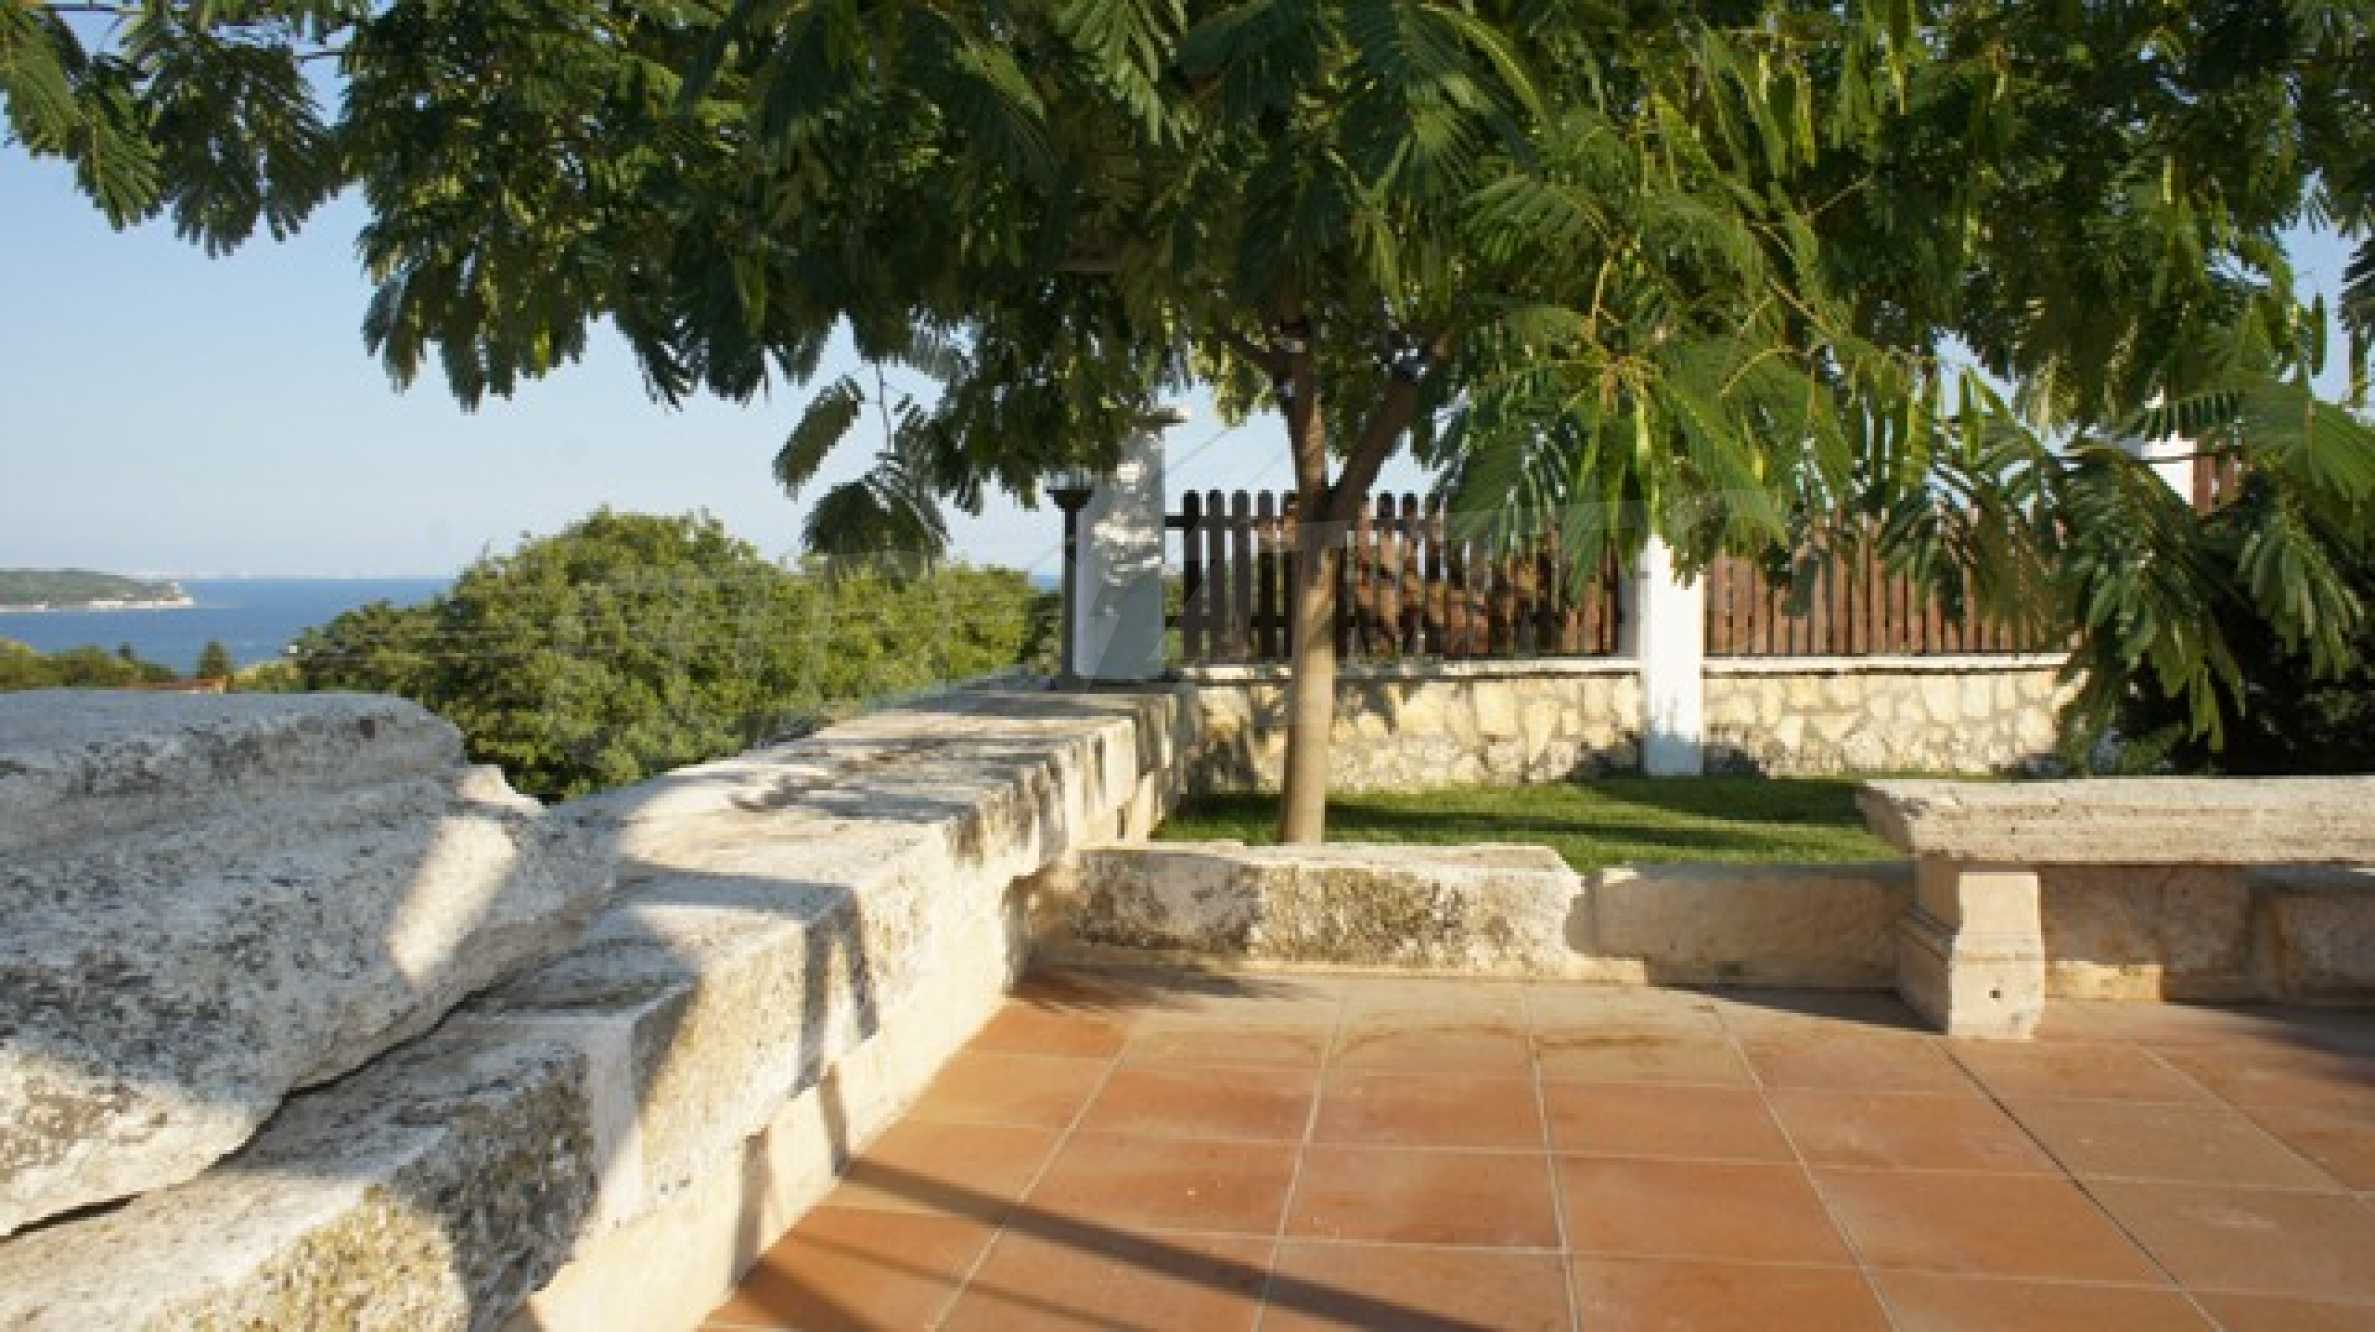 The Mediterranean style - a sense of luxury 18